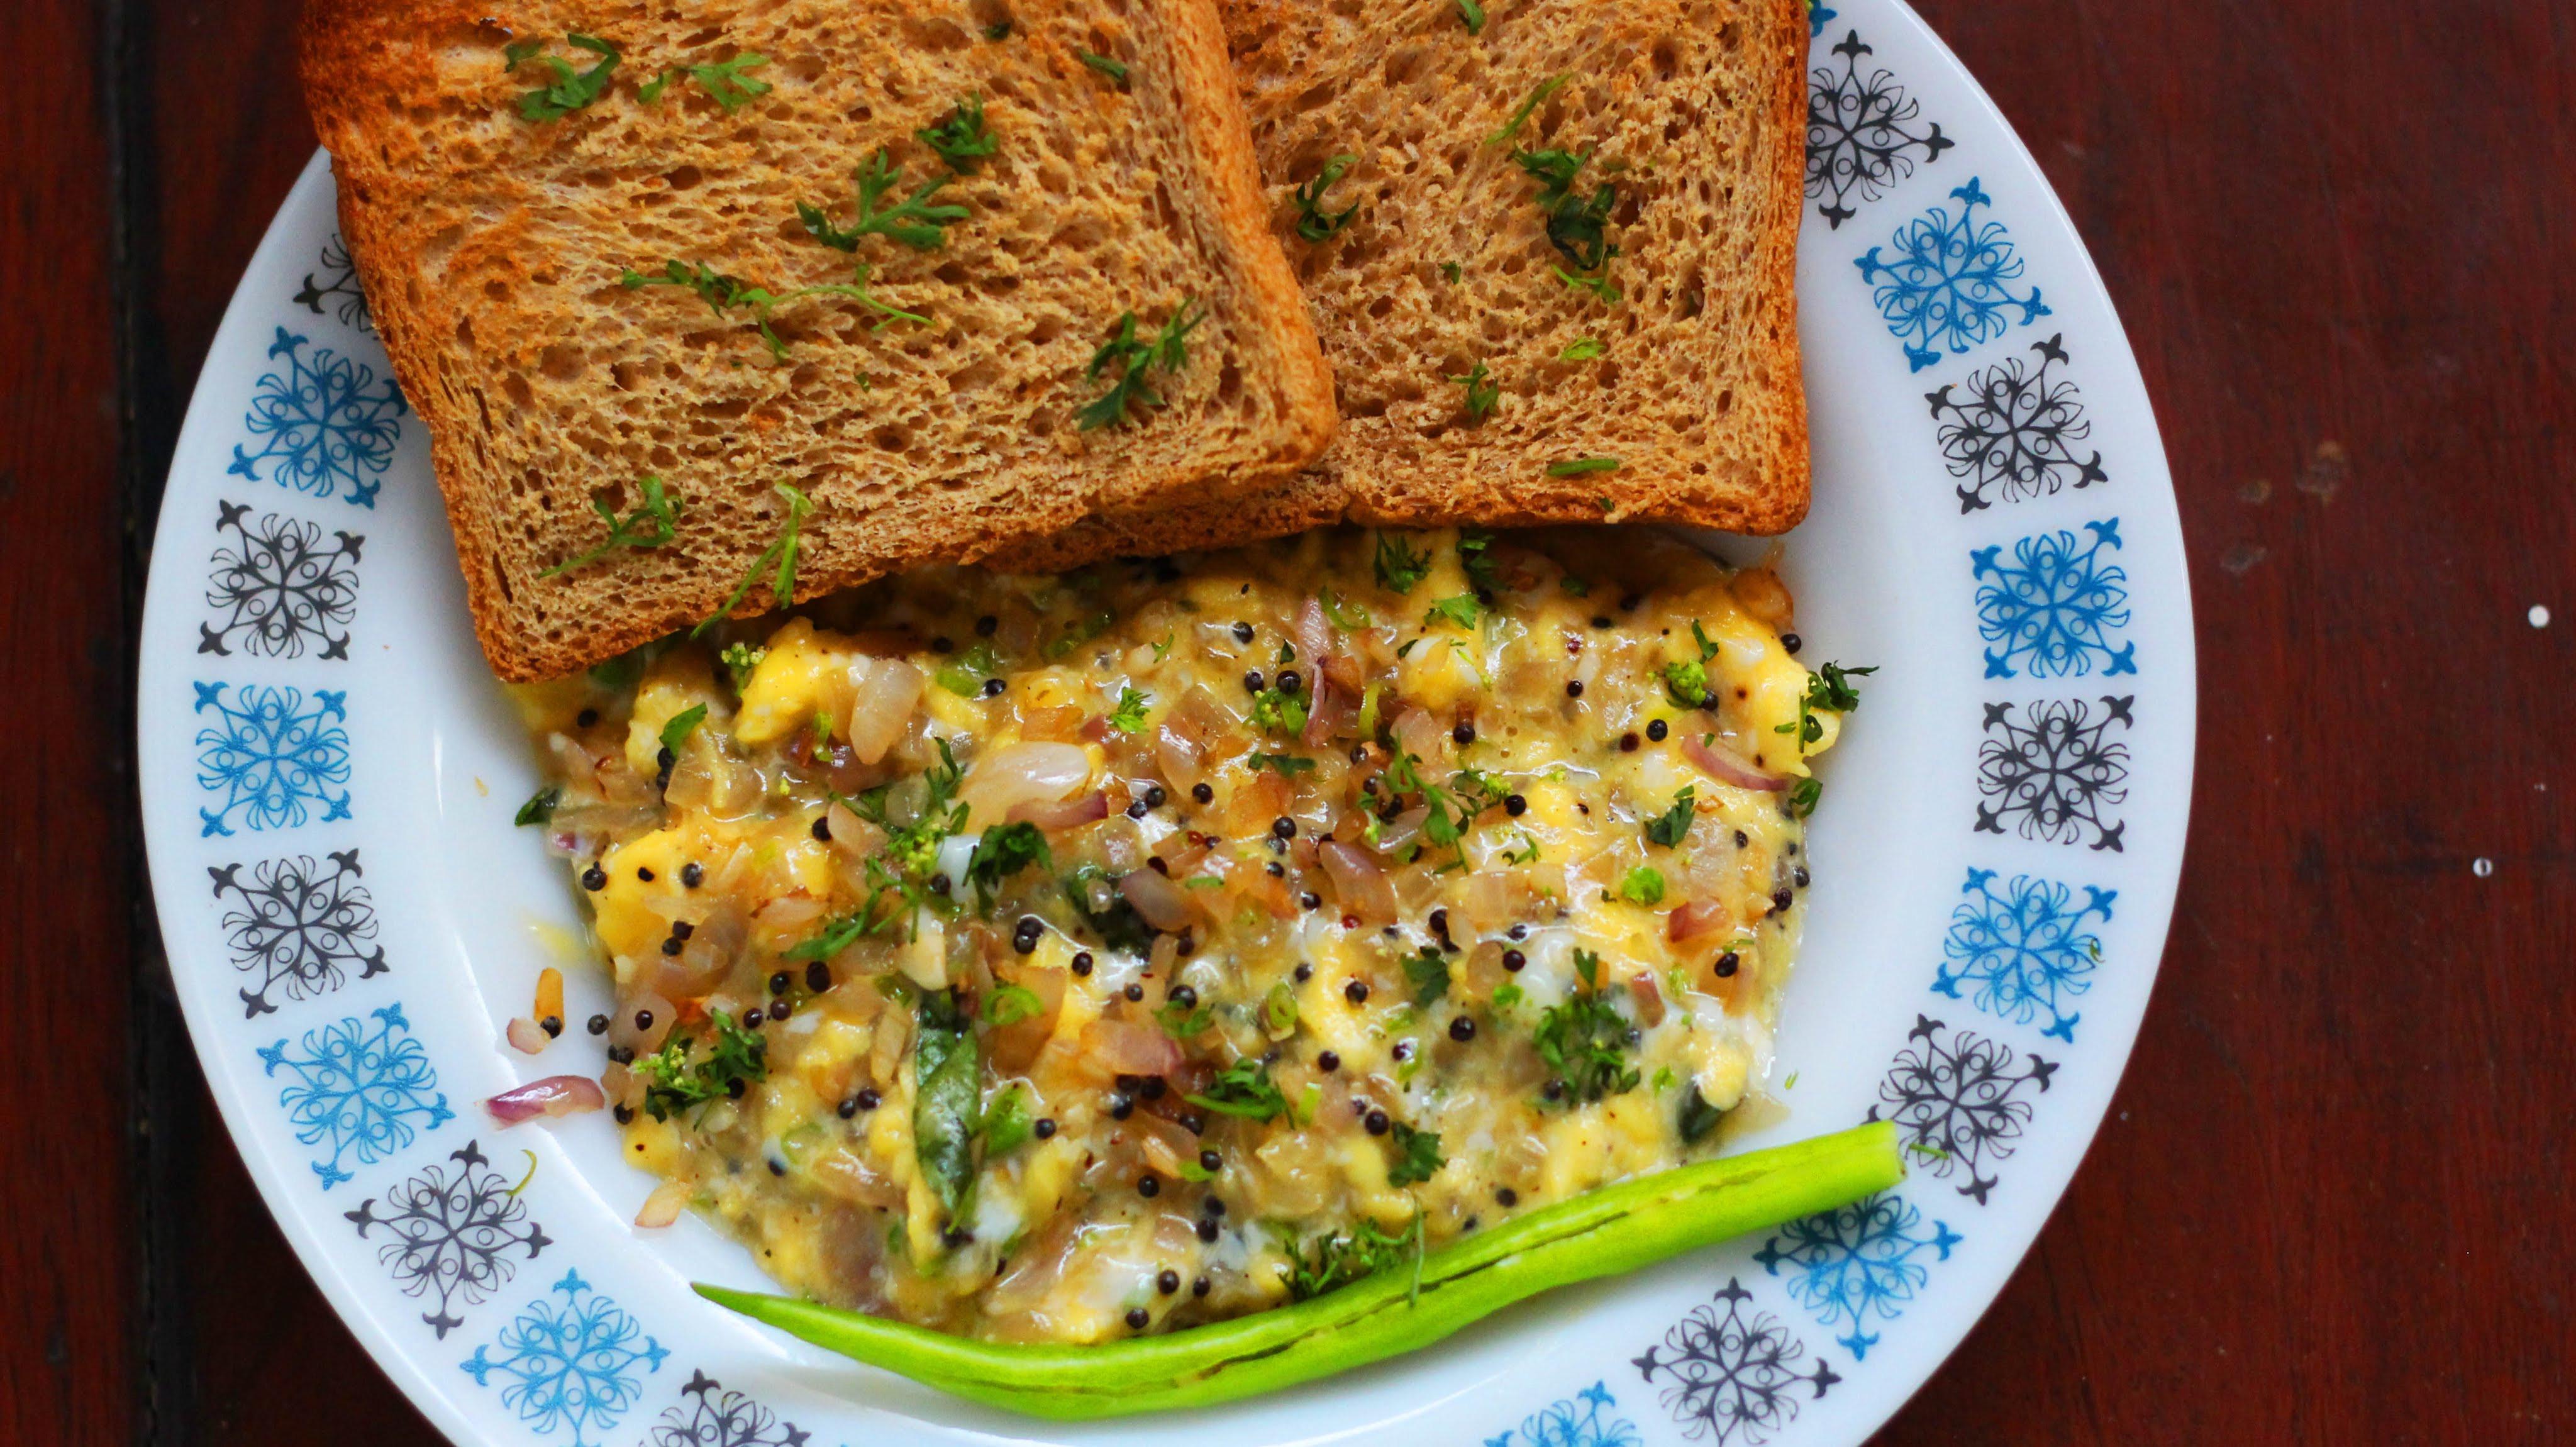 Healthy Breakfast Indian  Monchoso South Indian Egg Bhurji Low fat scrambled